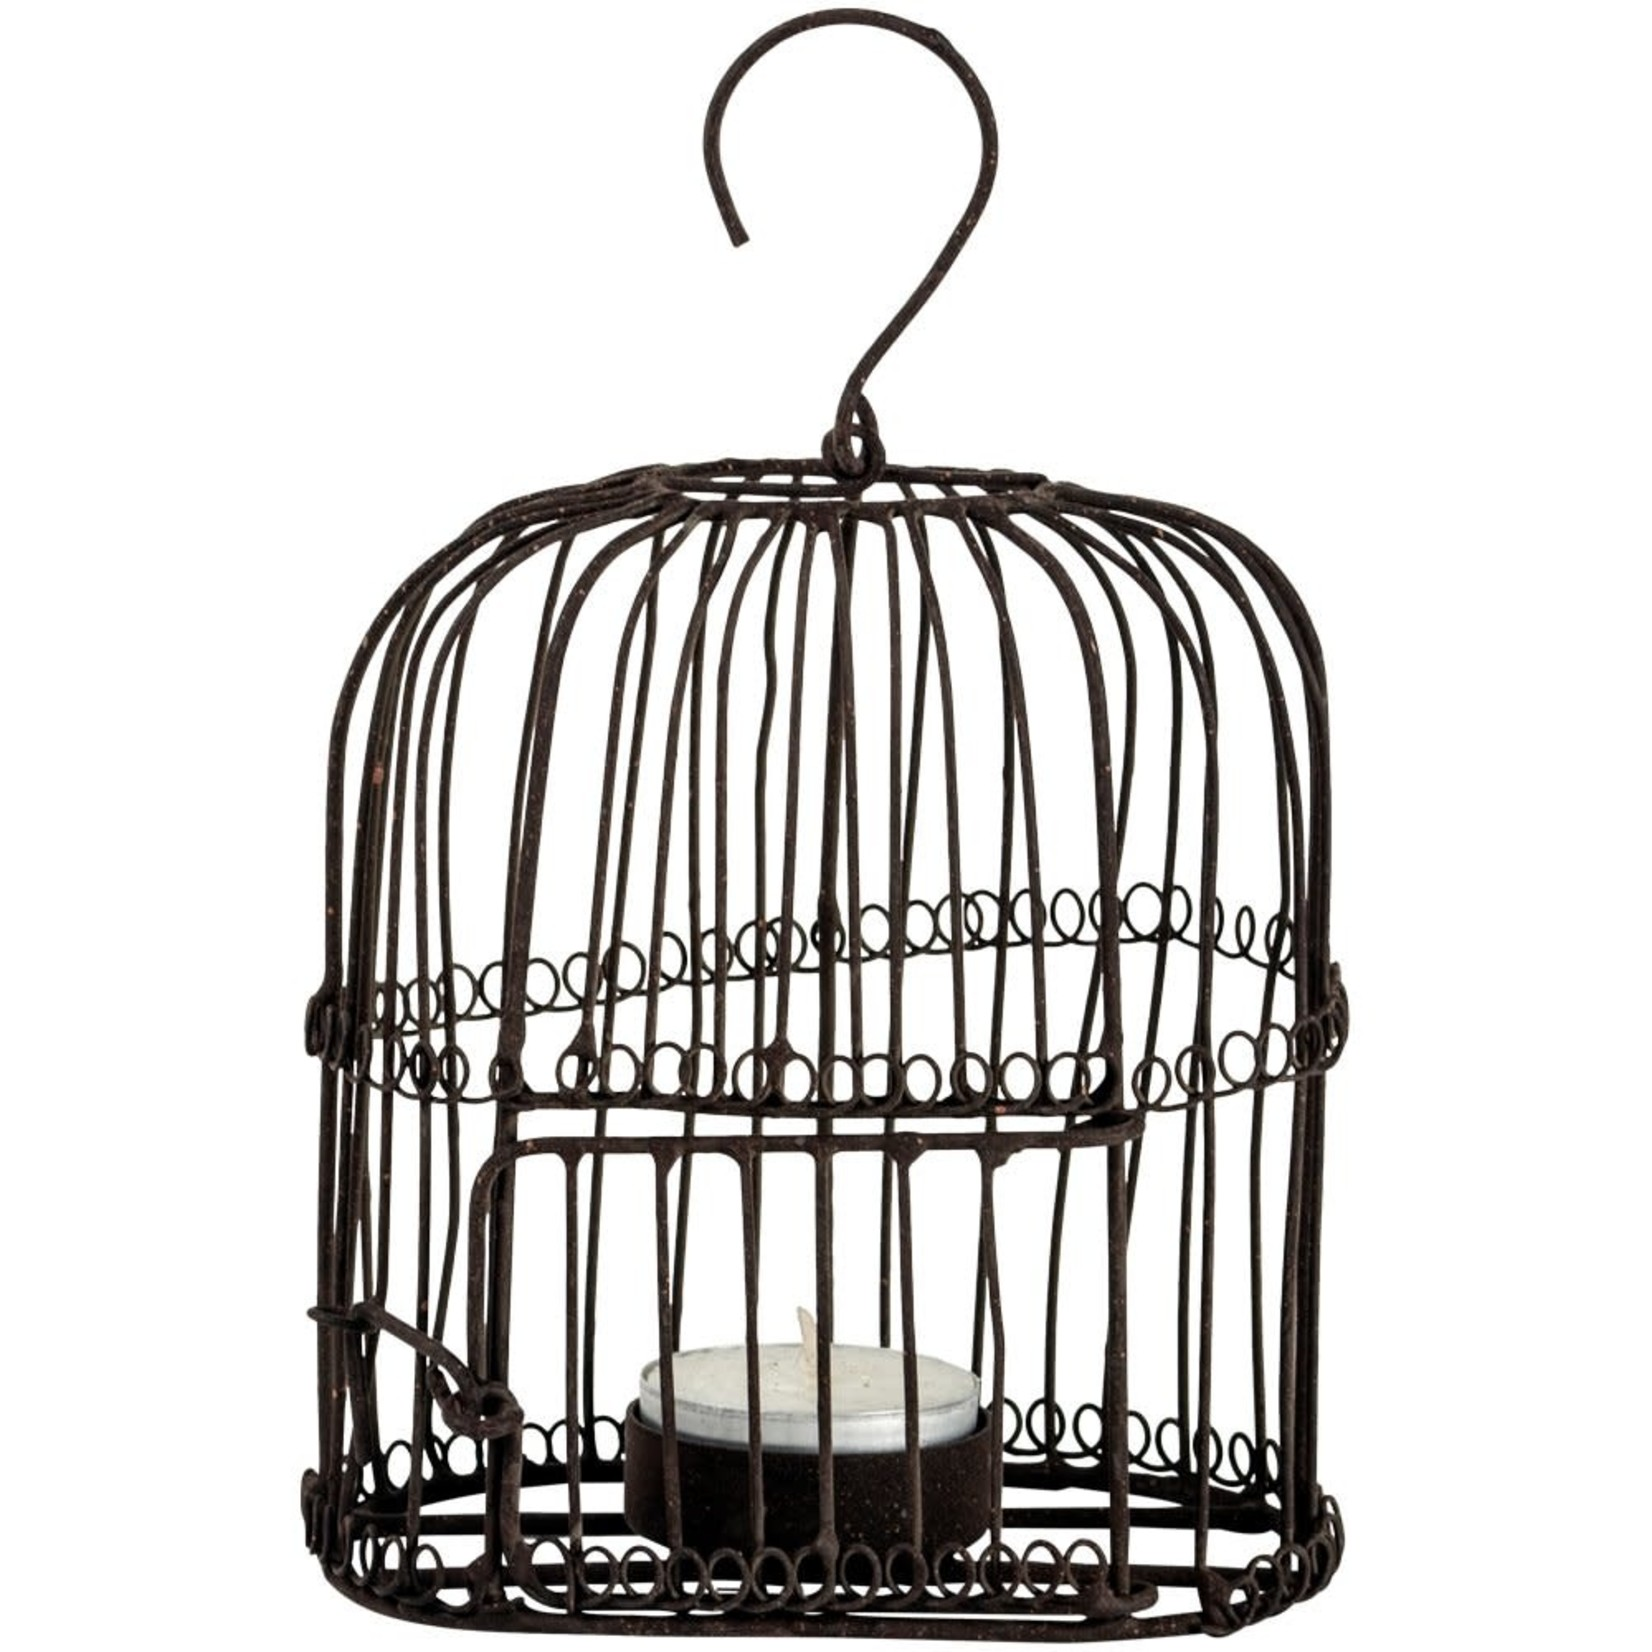 Grand Interiors Birdcage T-light Holder